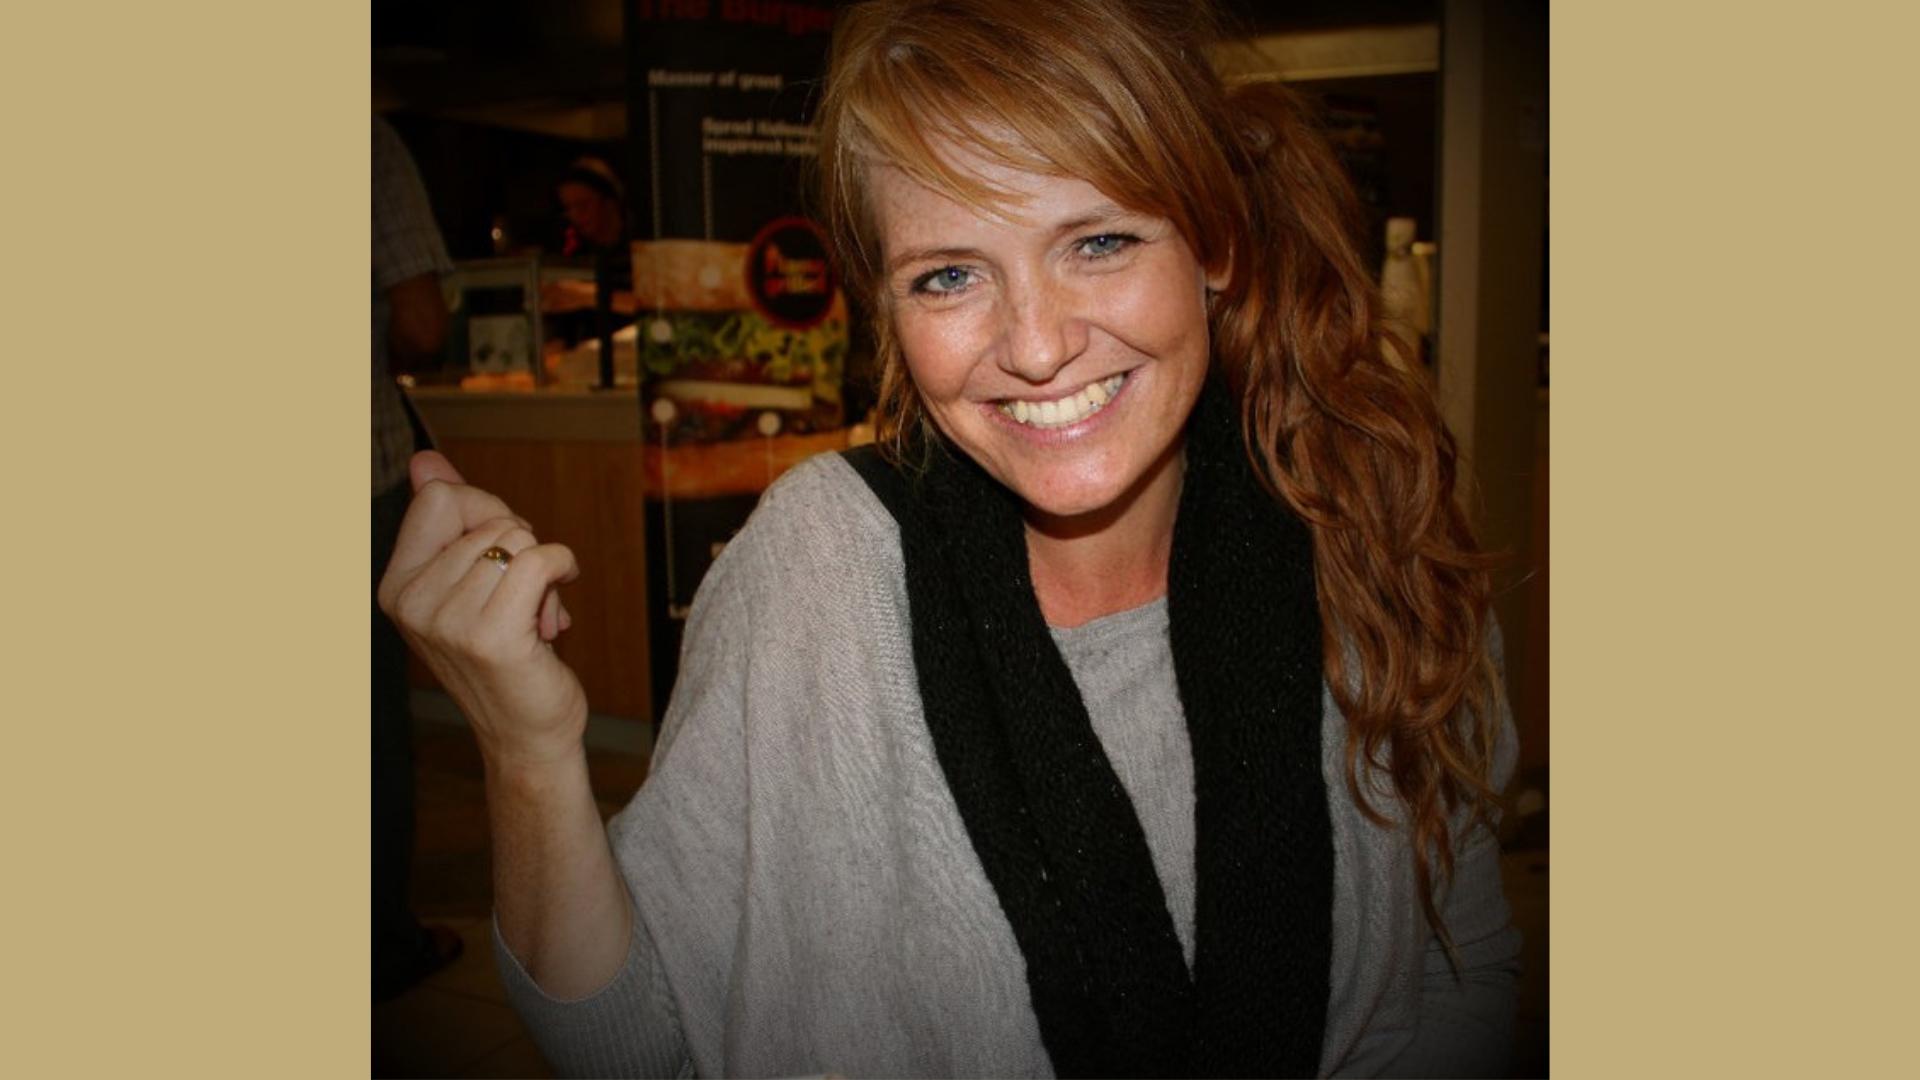 Heidi Klentz